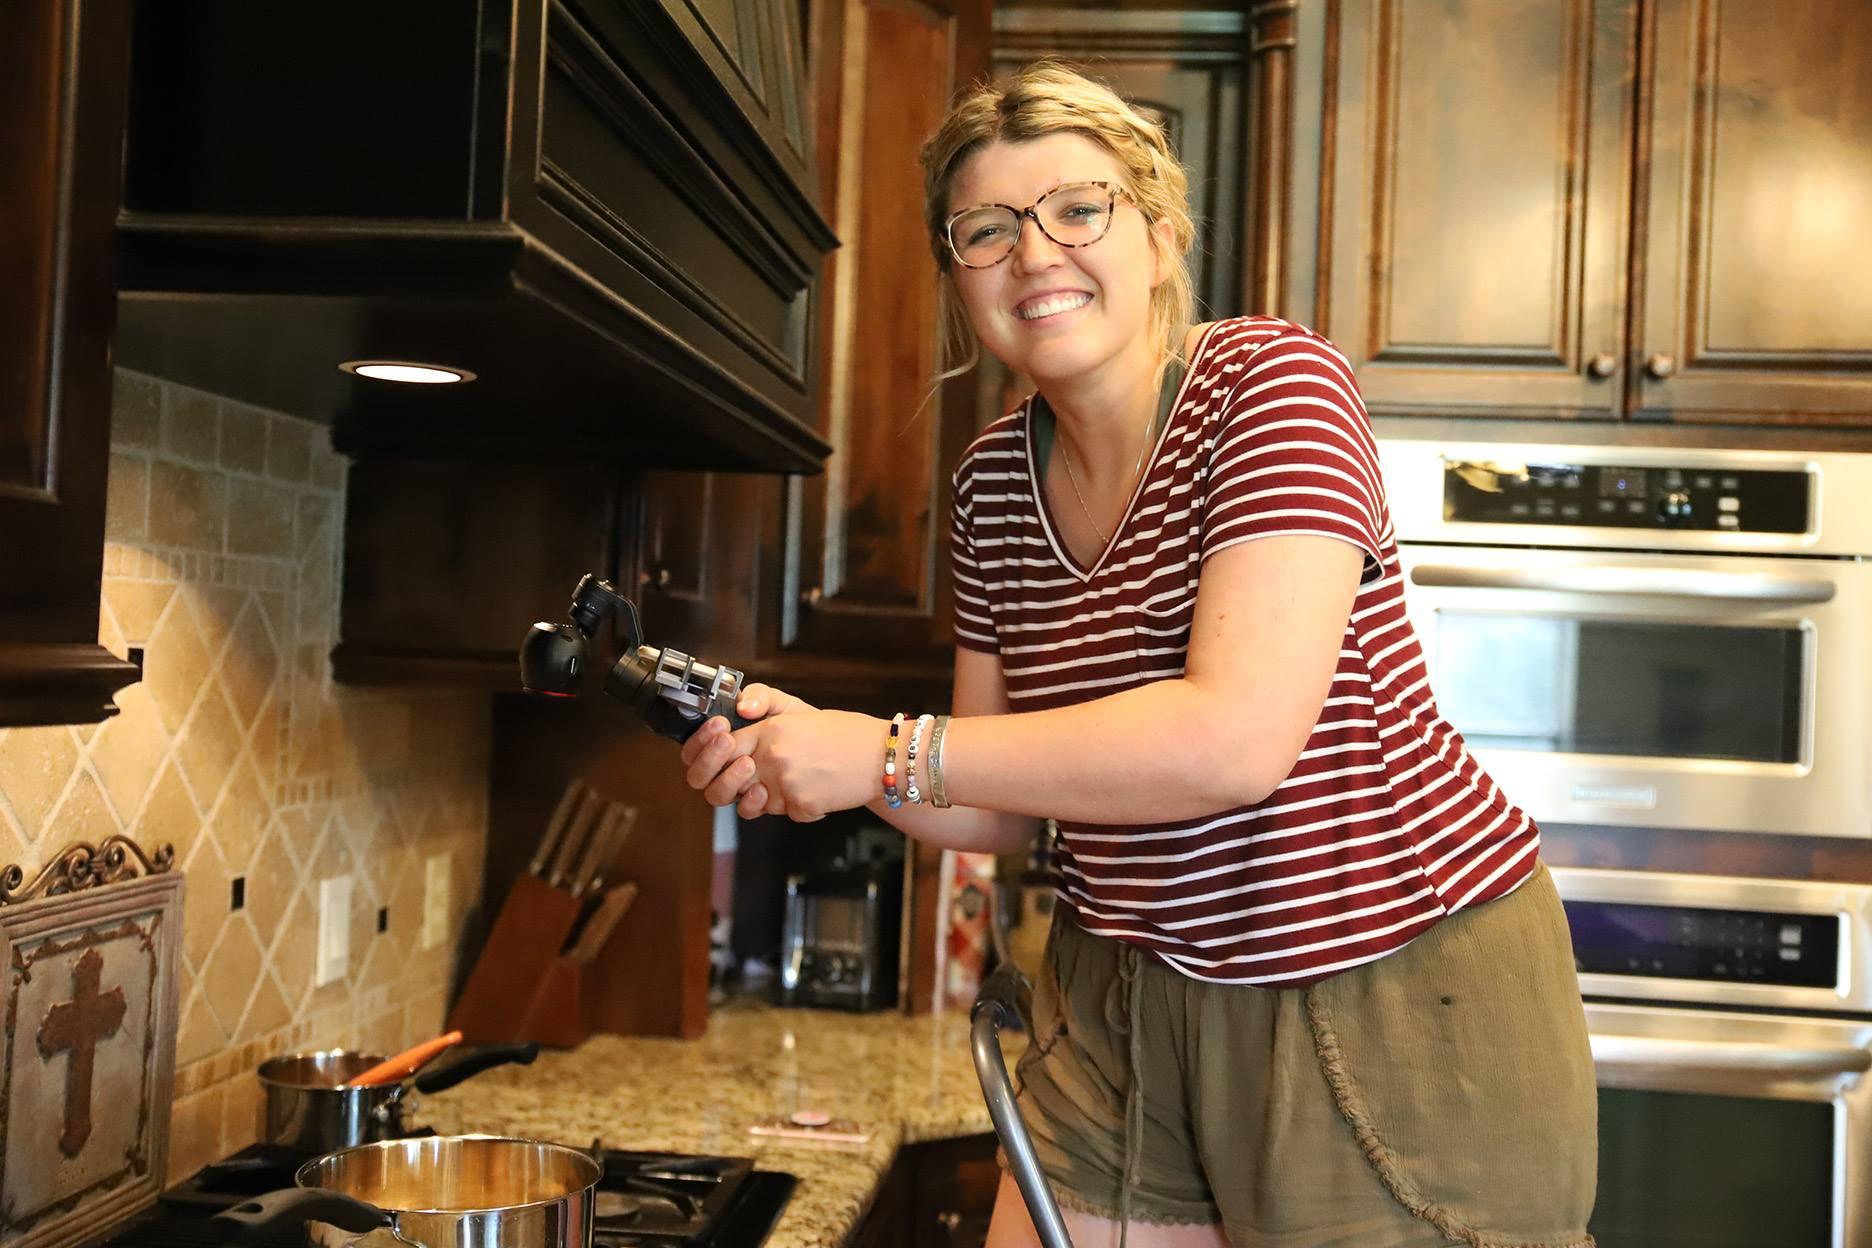 cooking video.jpeg